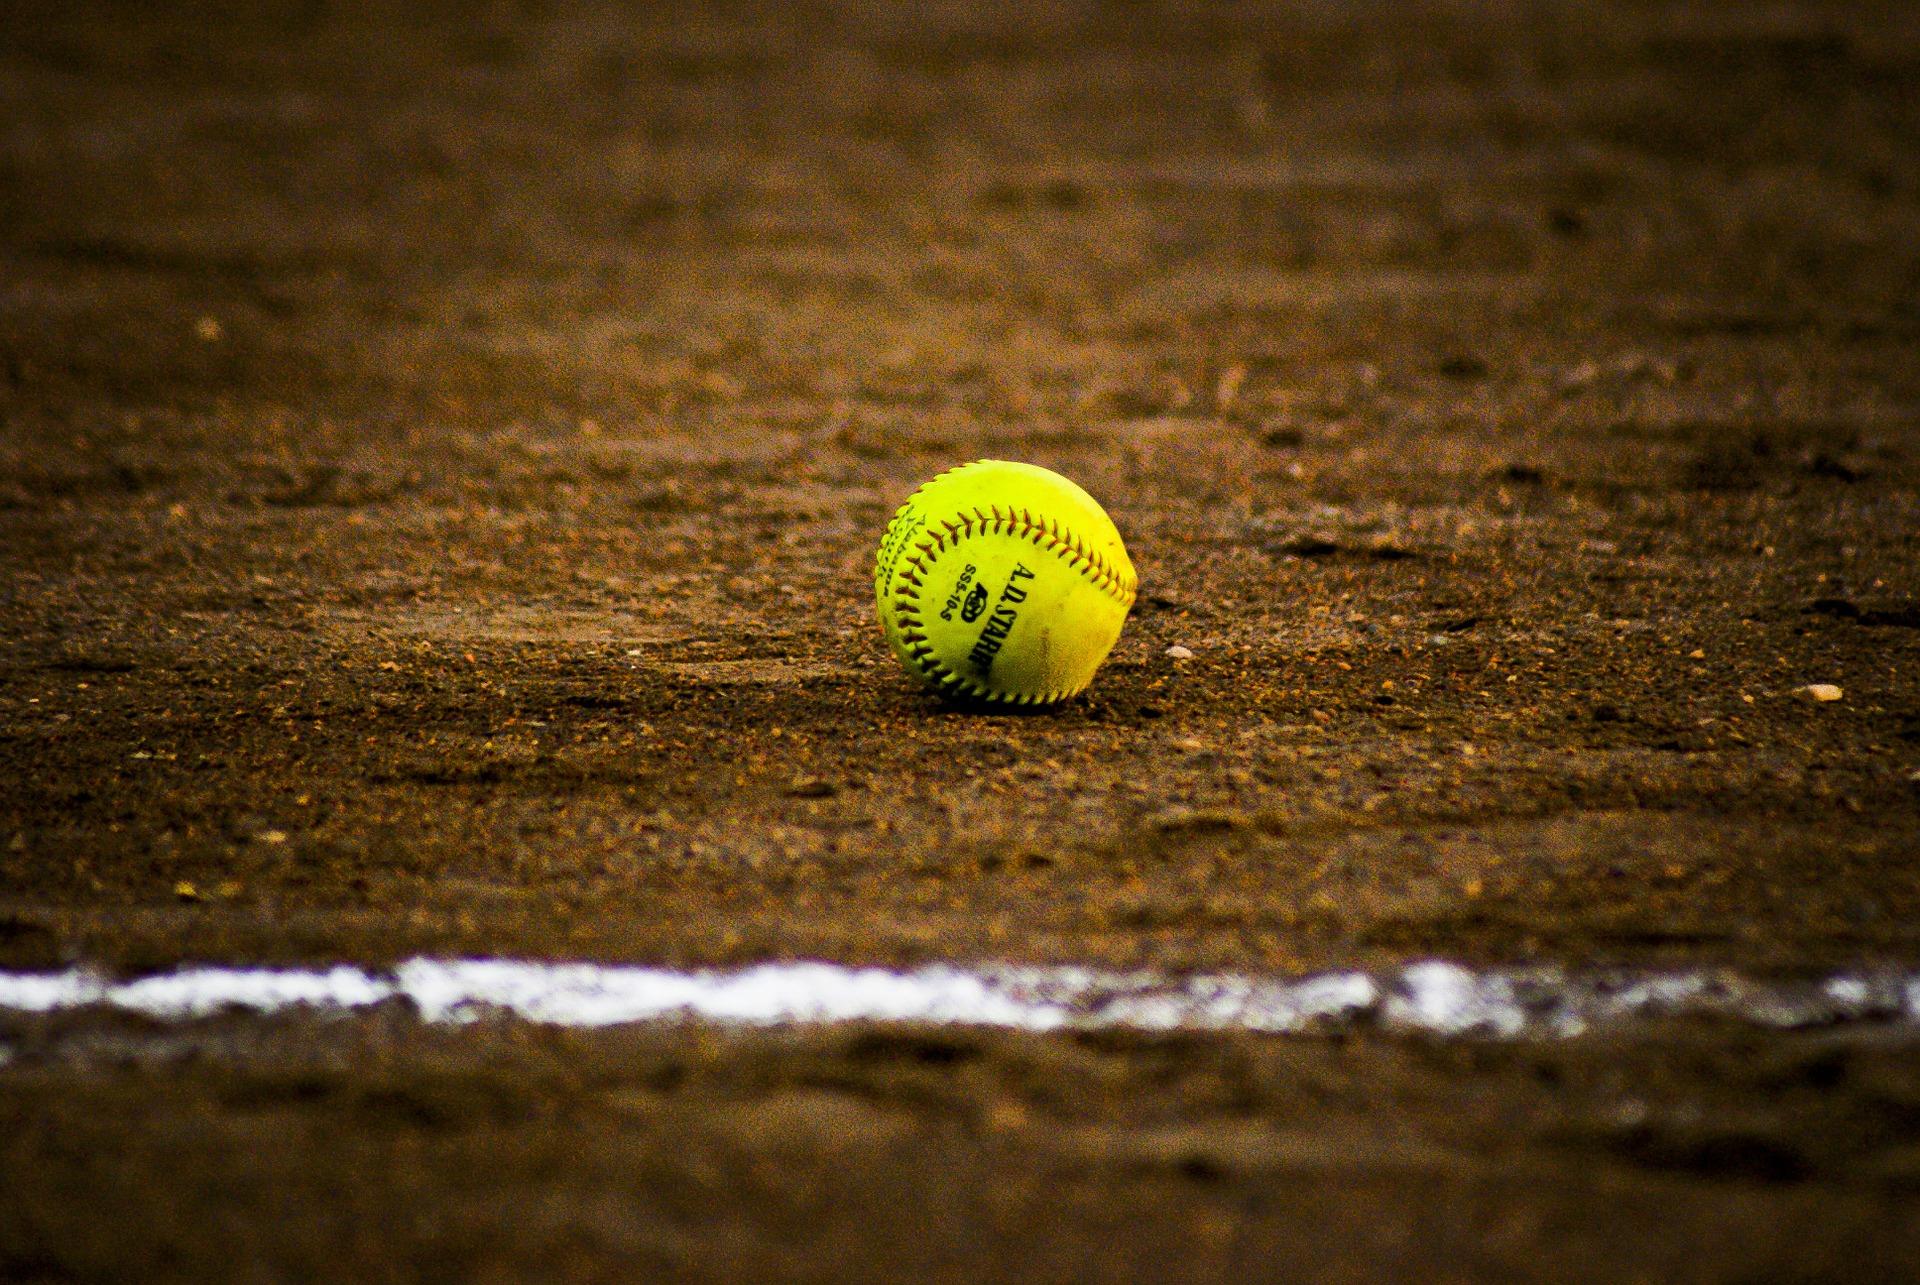 softball on a pitch